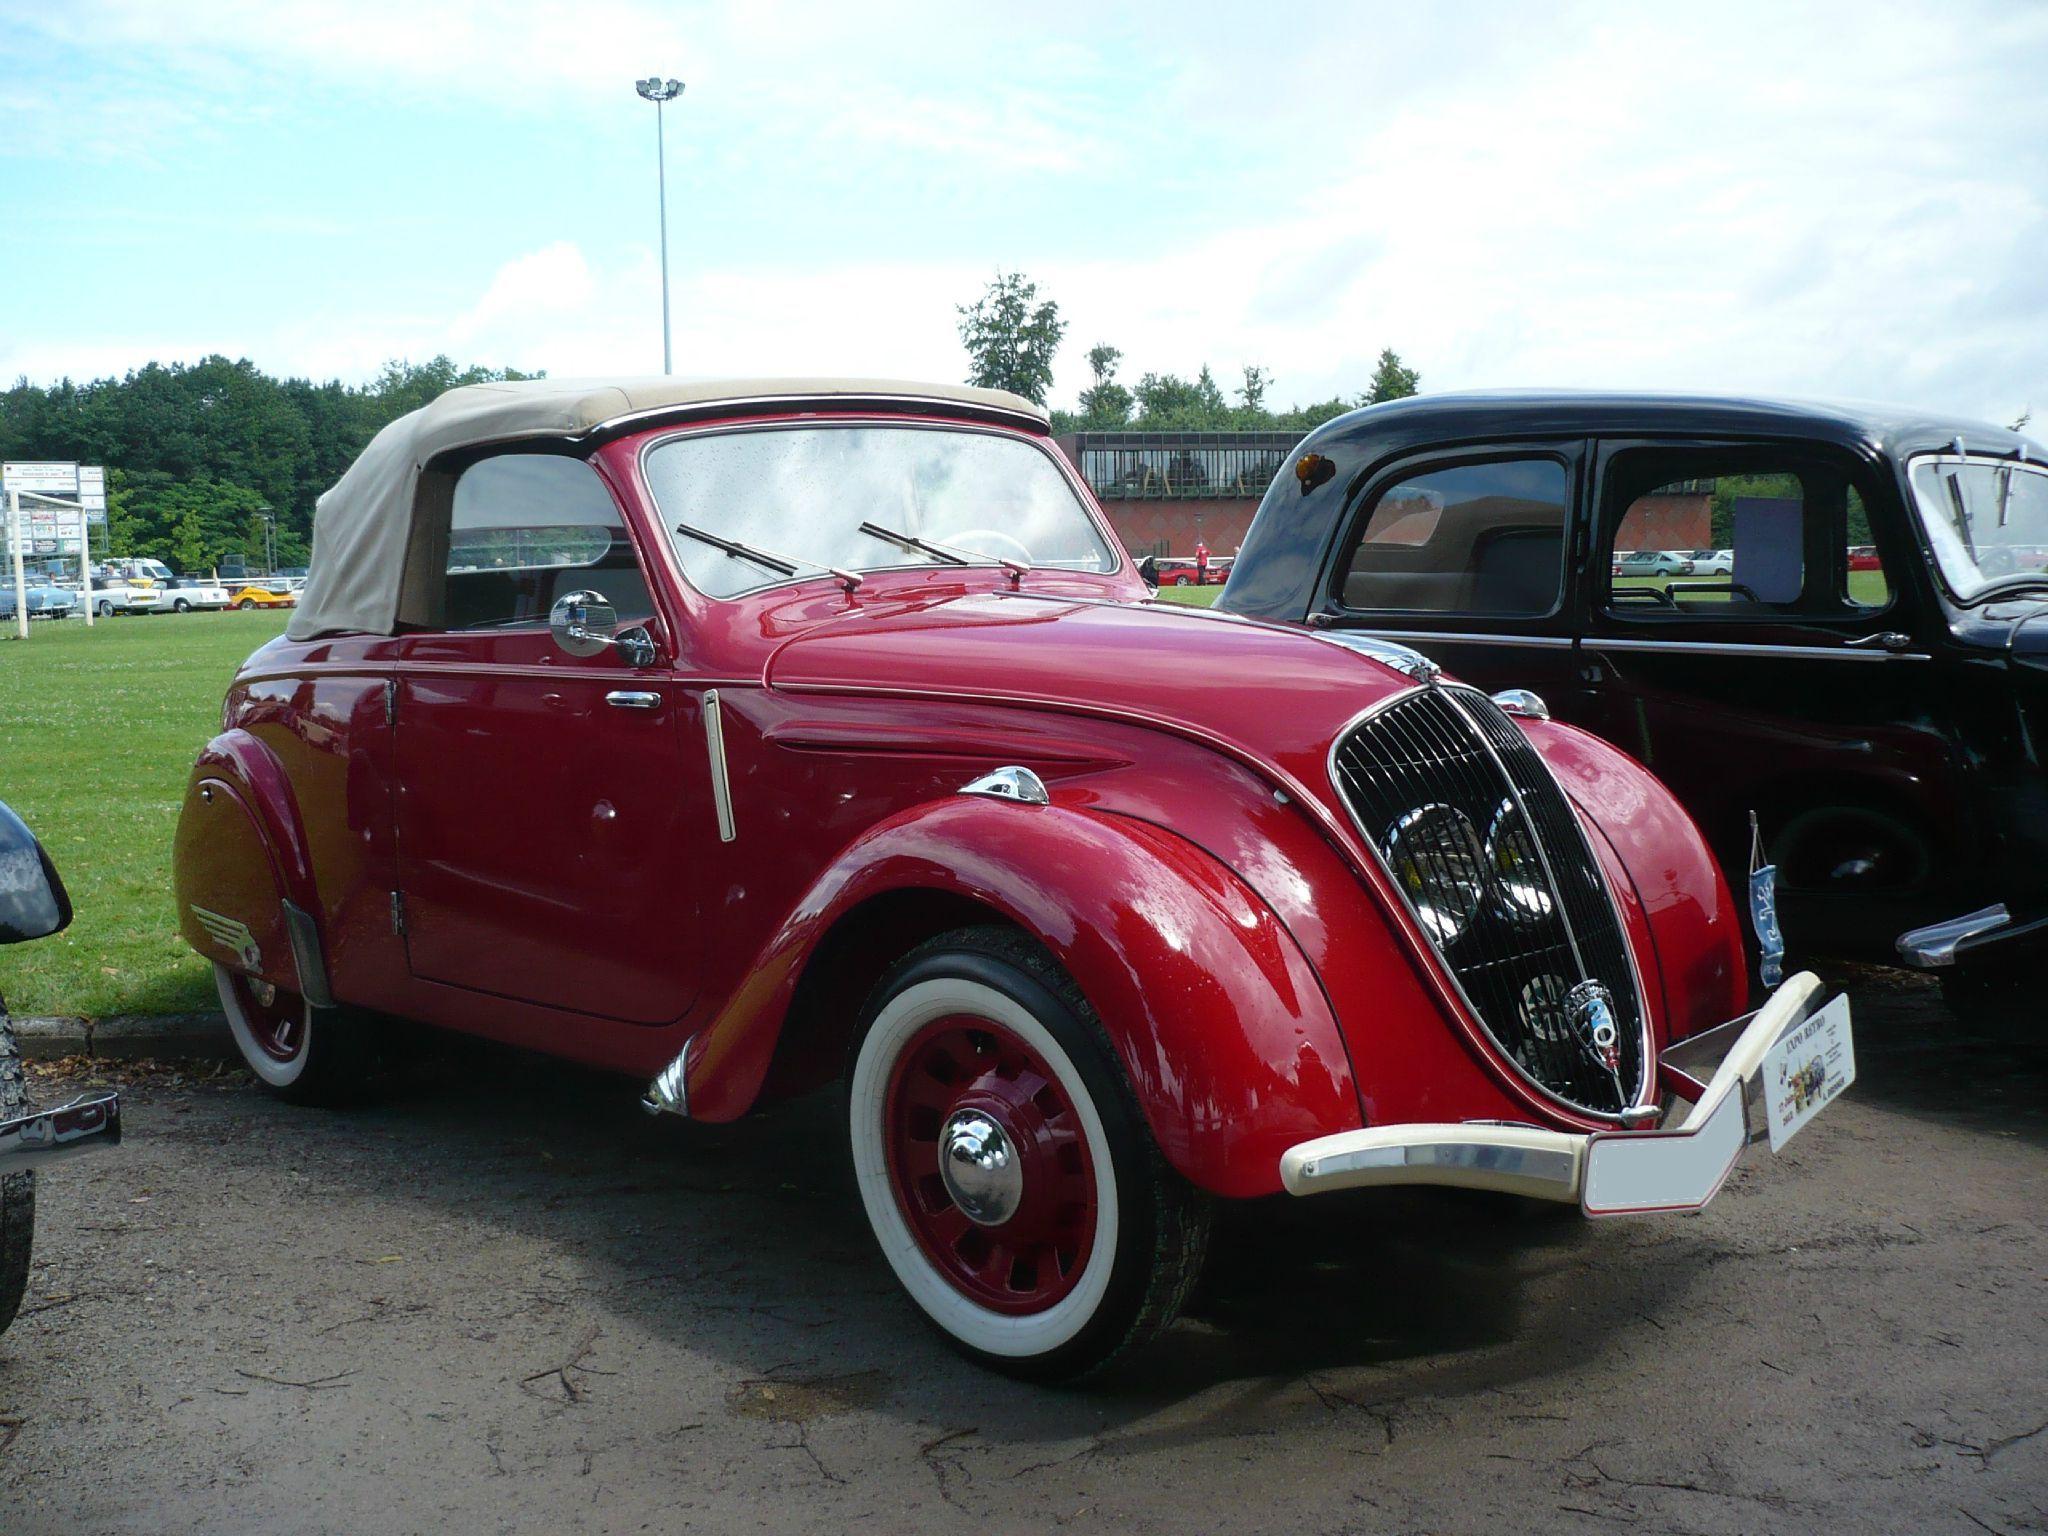 peugeot 202 cabriolet 1938 peugeot perfection pinterest voiture peugeot peugeot and voiture. Black Bedroom Furniture Sets. Home Design Ideas